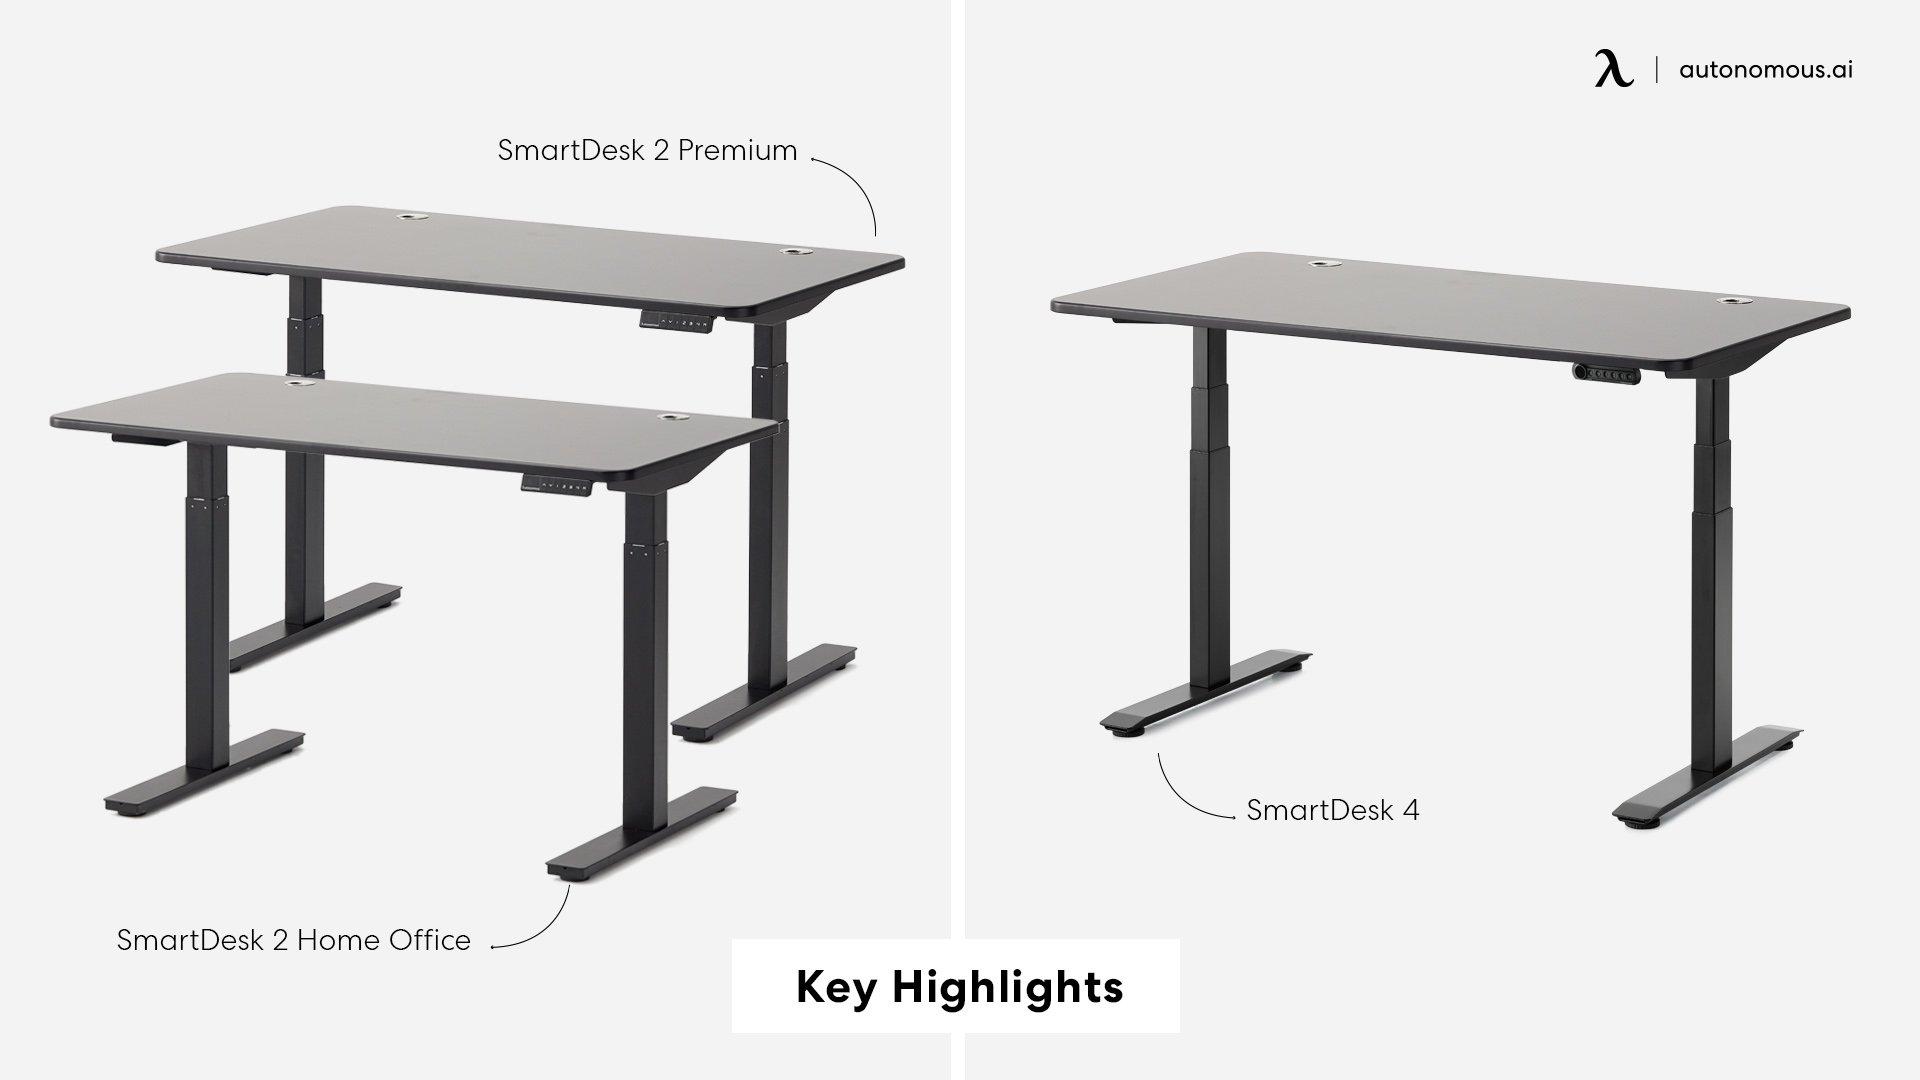 Key Highlights of SmartDesk 2 and  SmartDesk 4